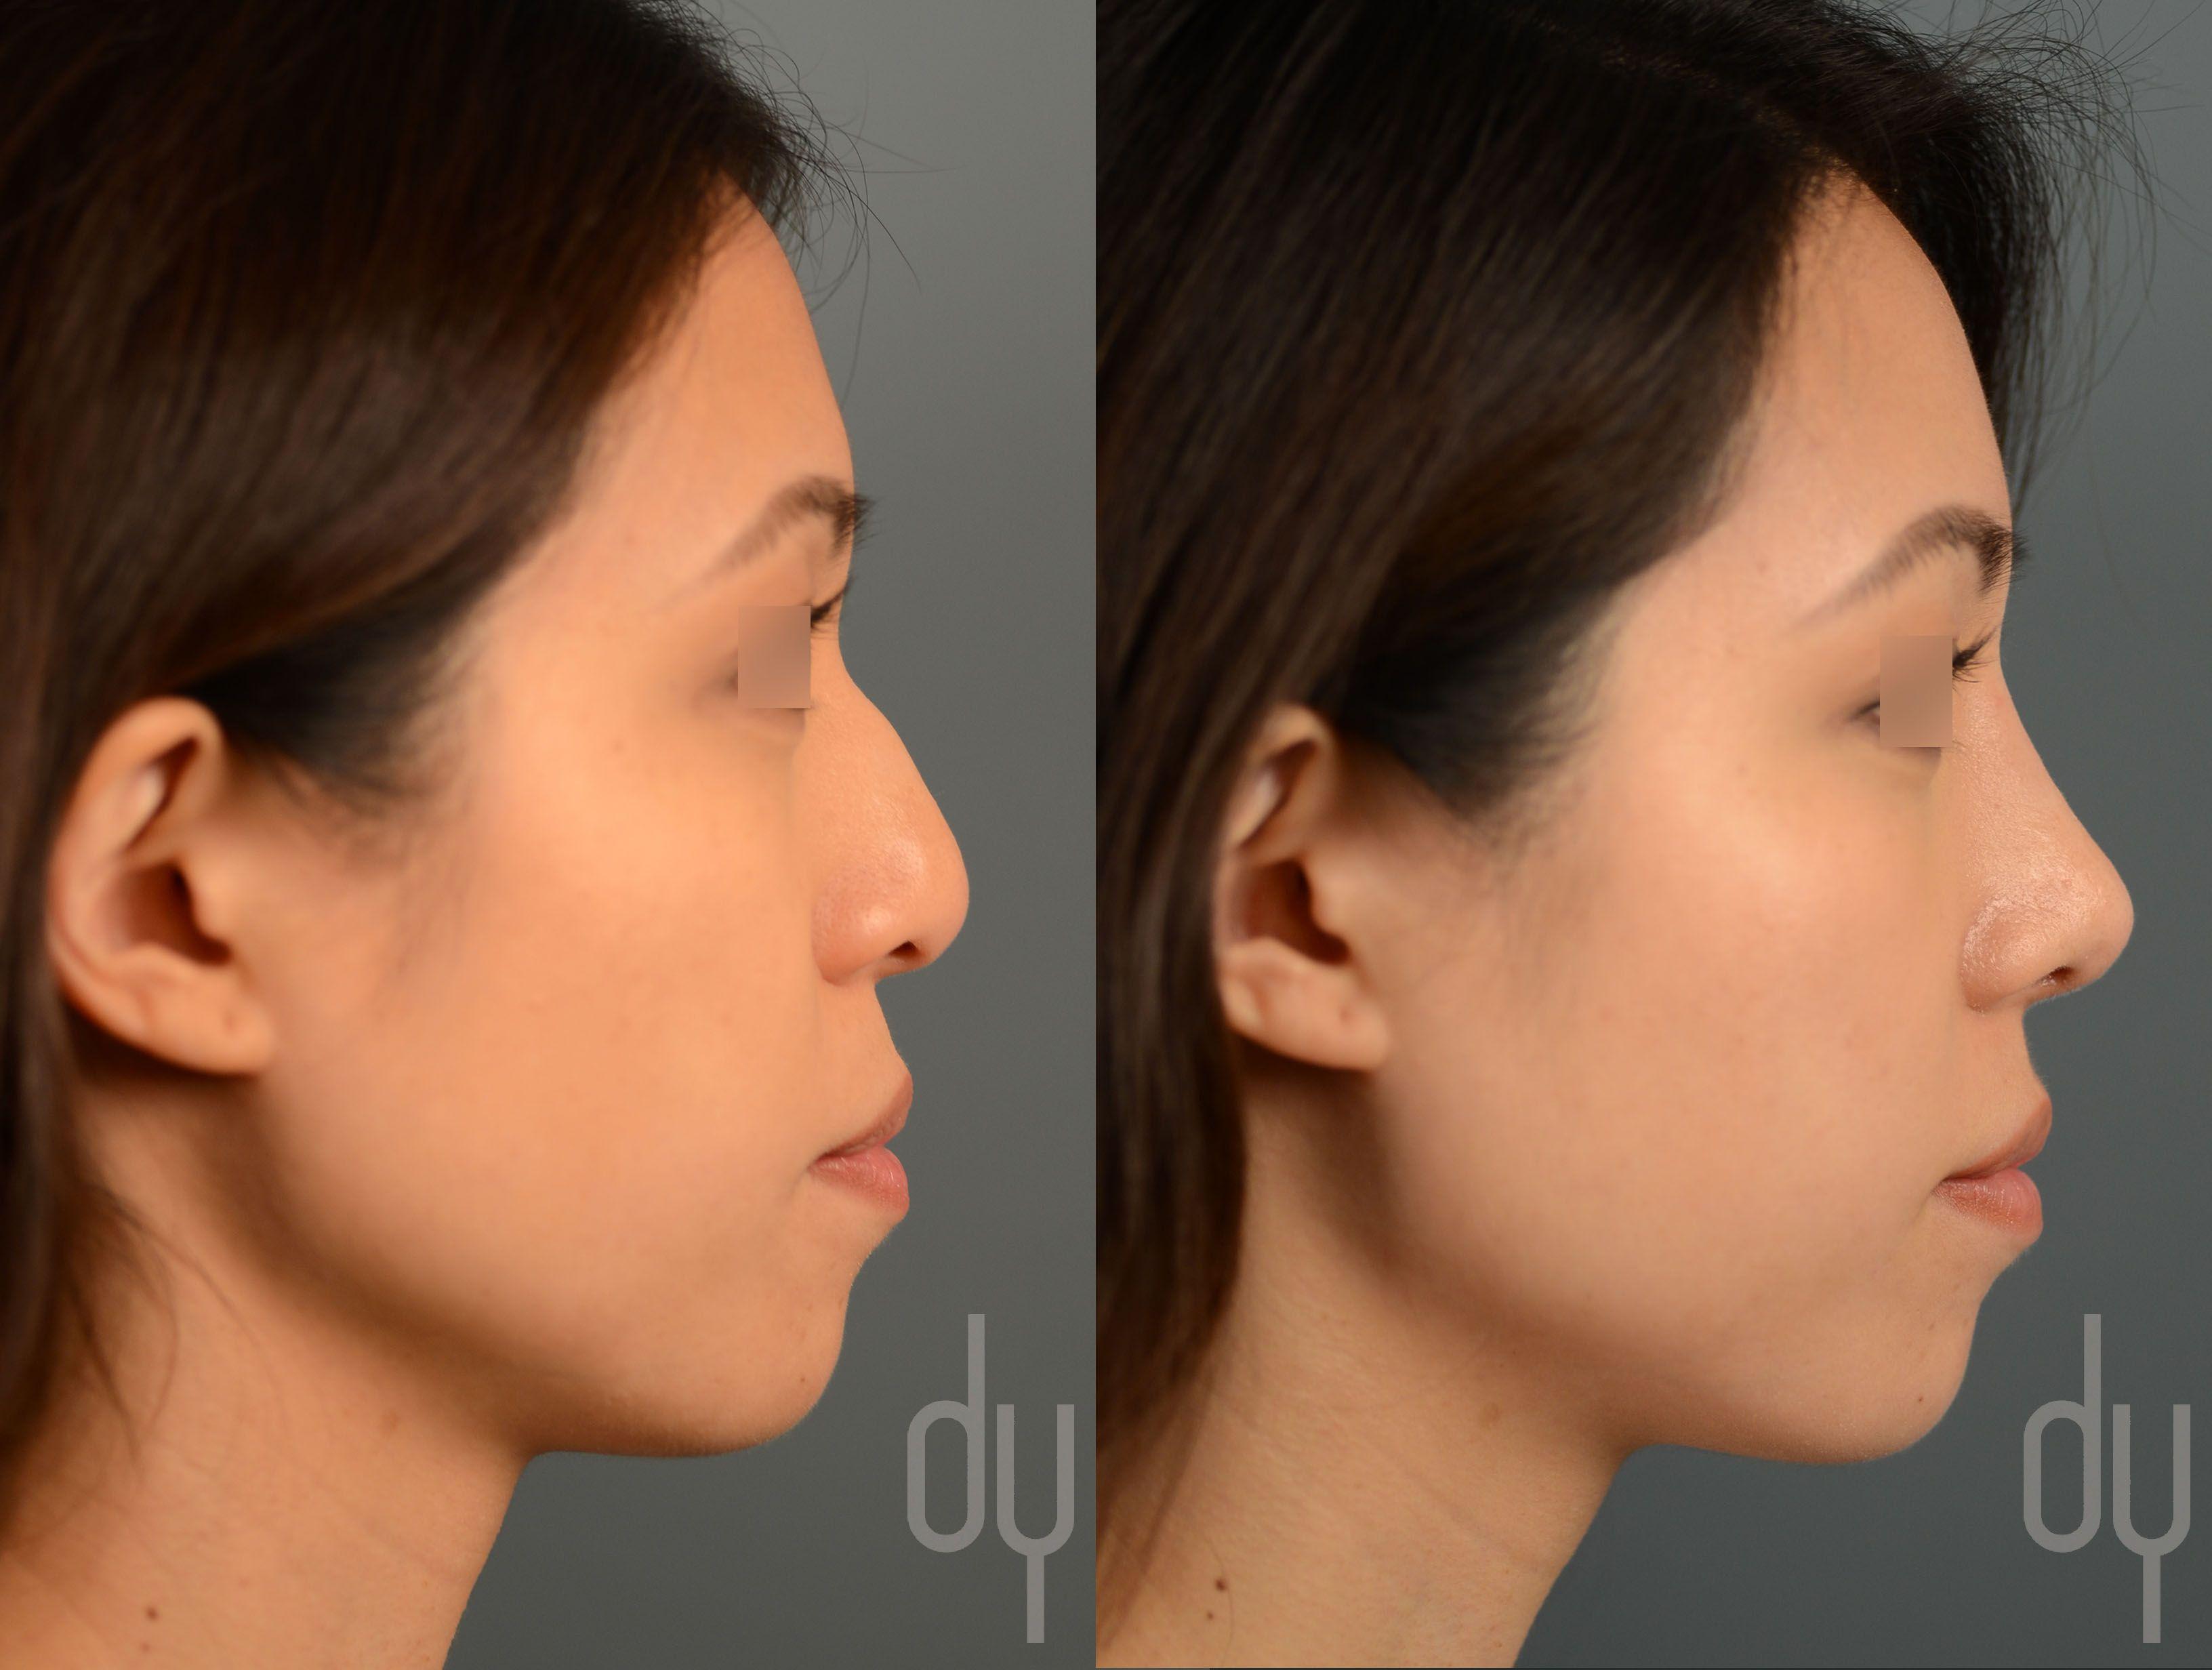 Understand you. asian rhinoplasty specialist were